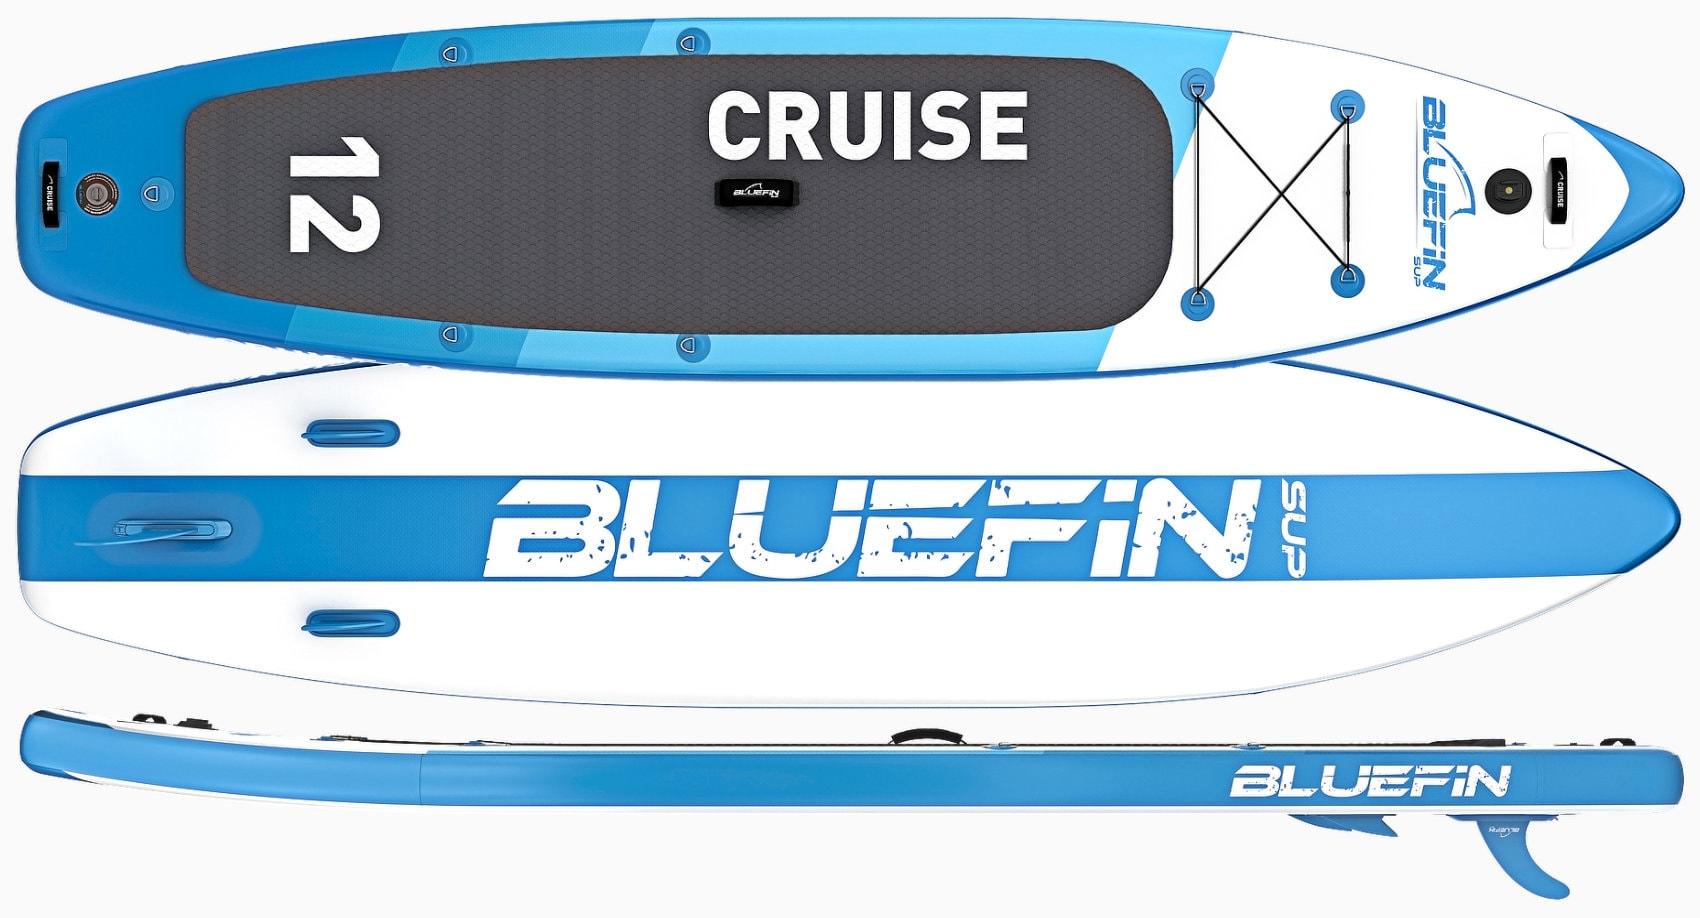 Bluefin SUP Cruise 12' Touring Model